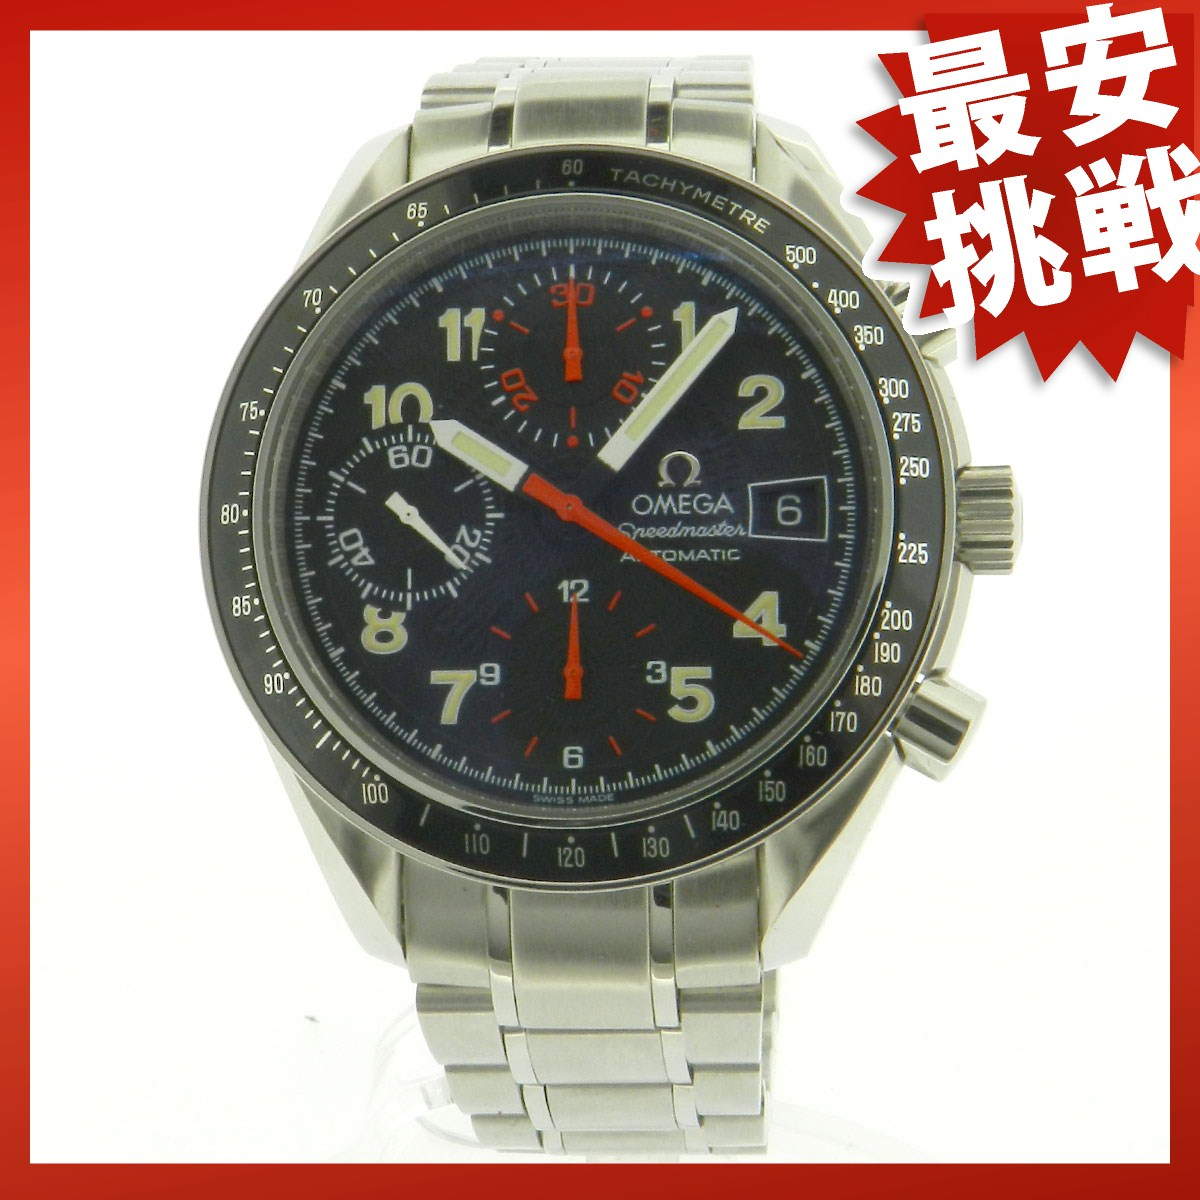 OMEGA Speedmaster mark 40 SS mens wrist watch